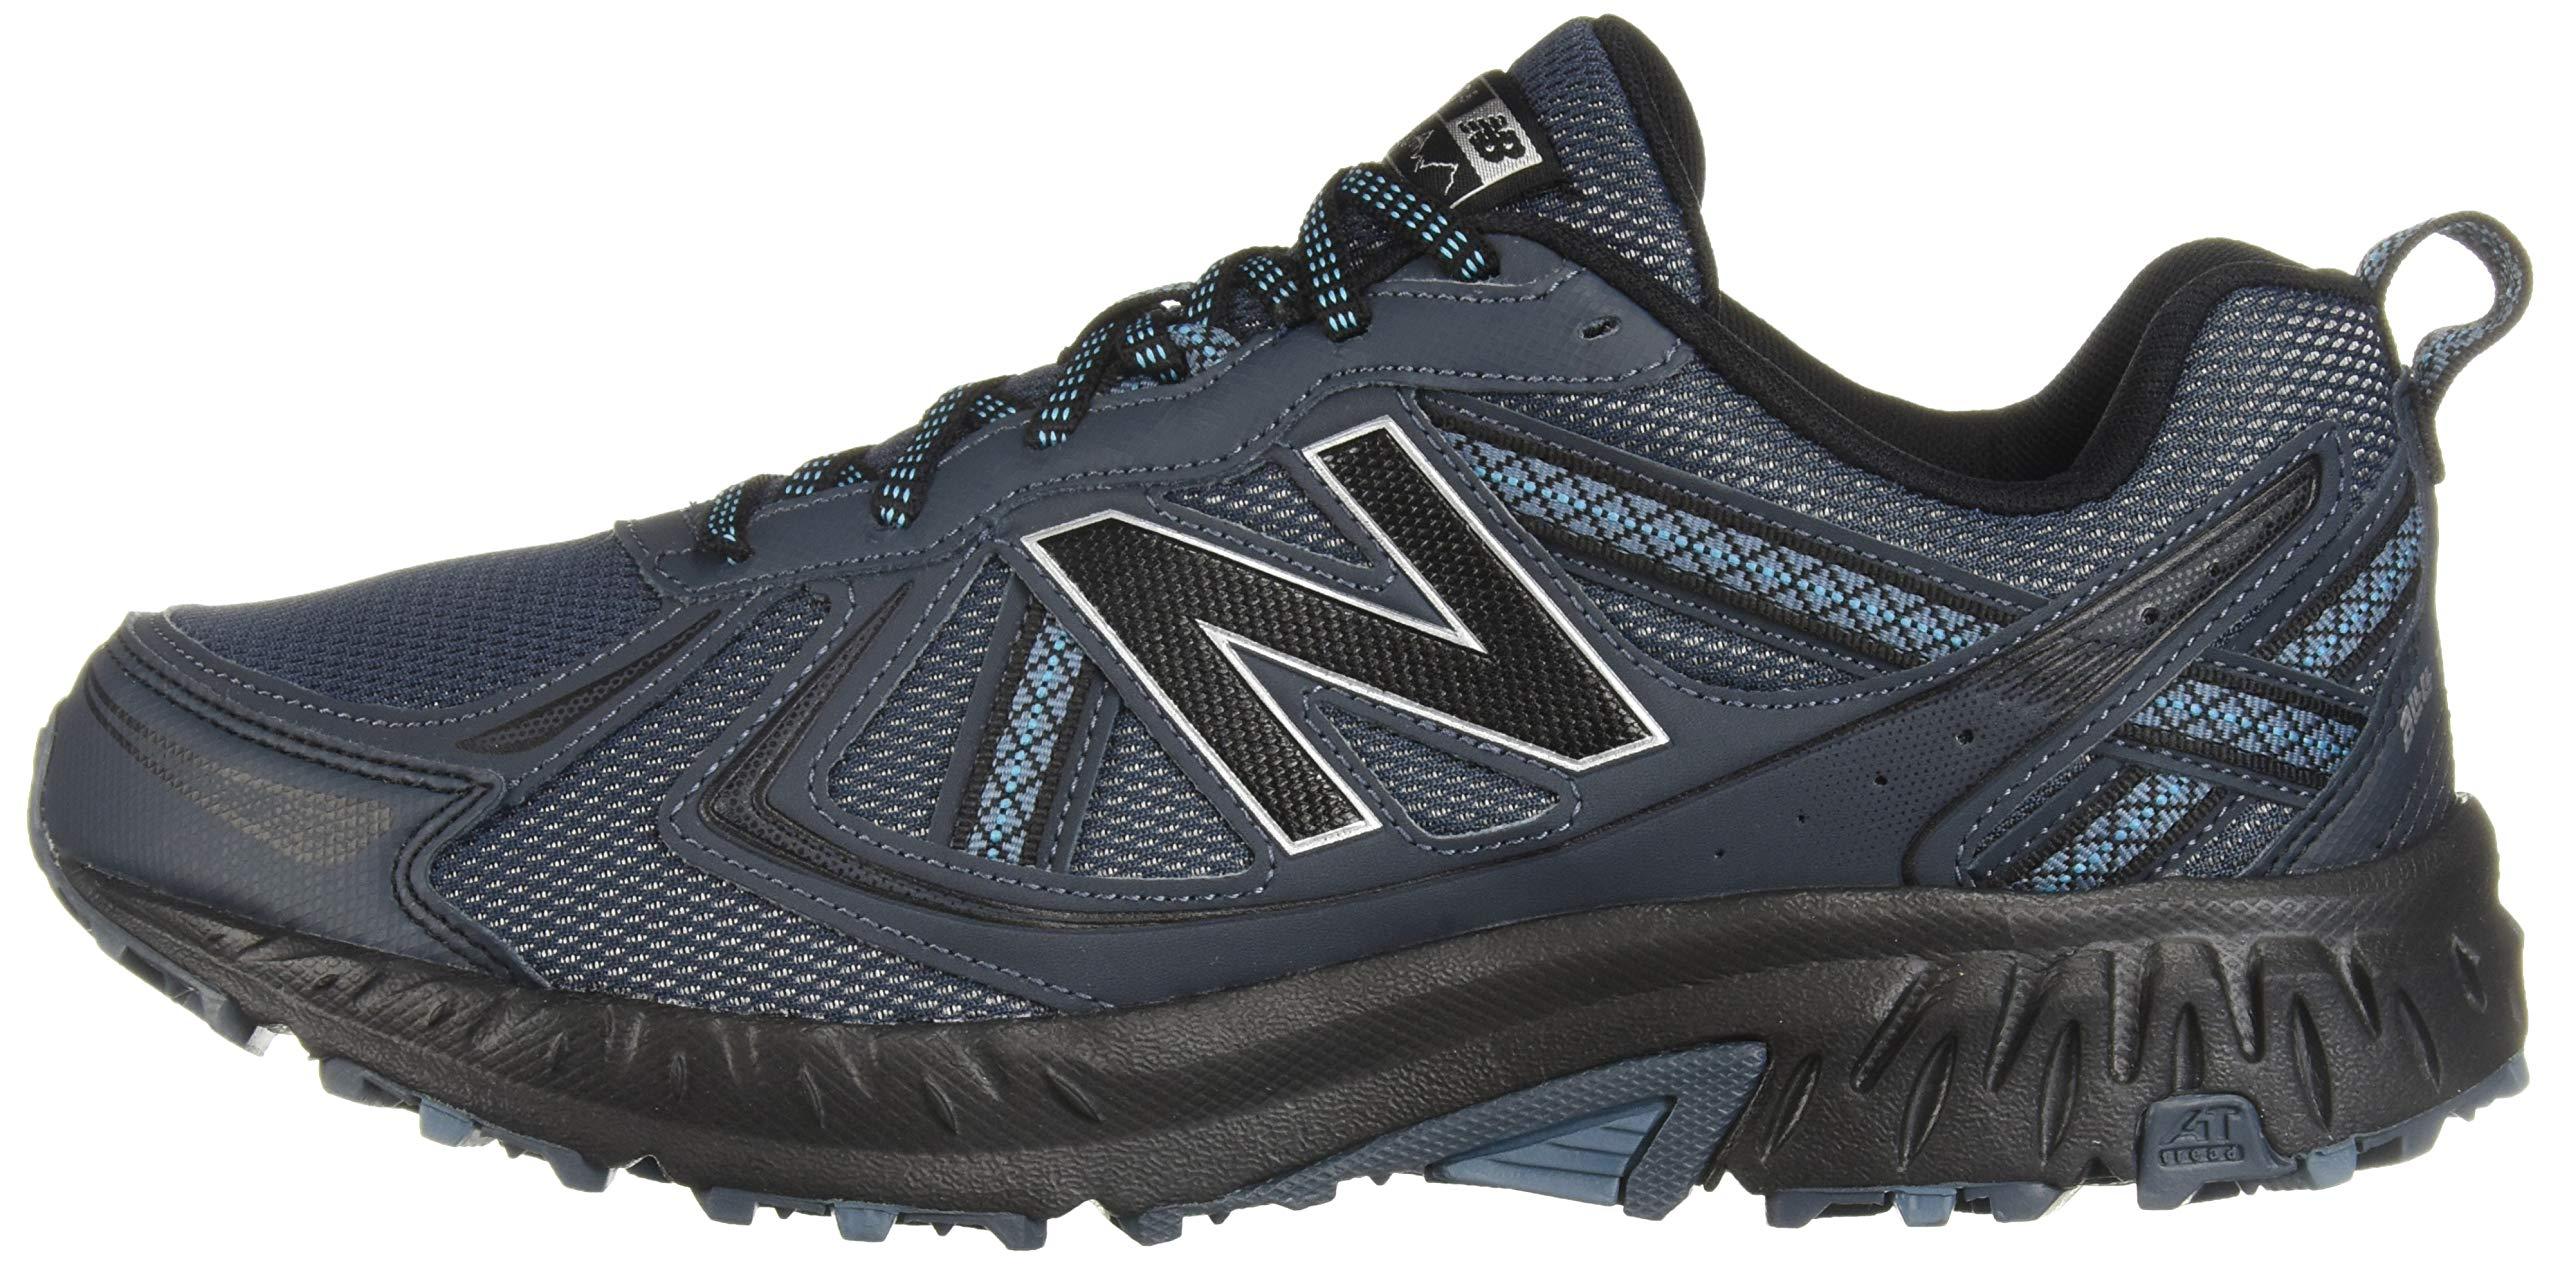 New Balance Men's 410v5 Cushioning Trail Running Shoe, Petrol/Cadet/Black, 7 D US by New Balance (Image #5)